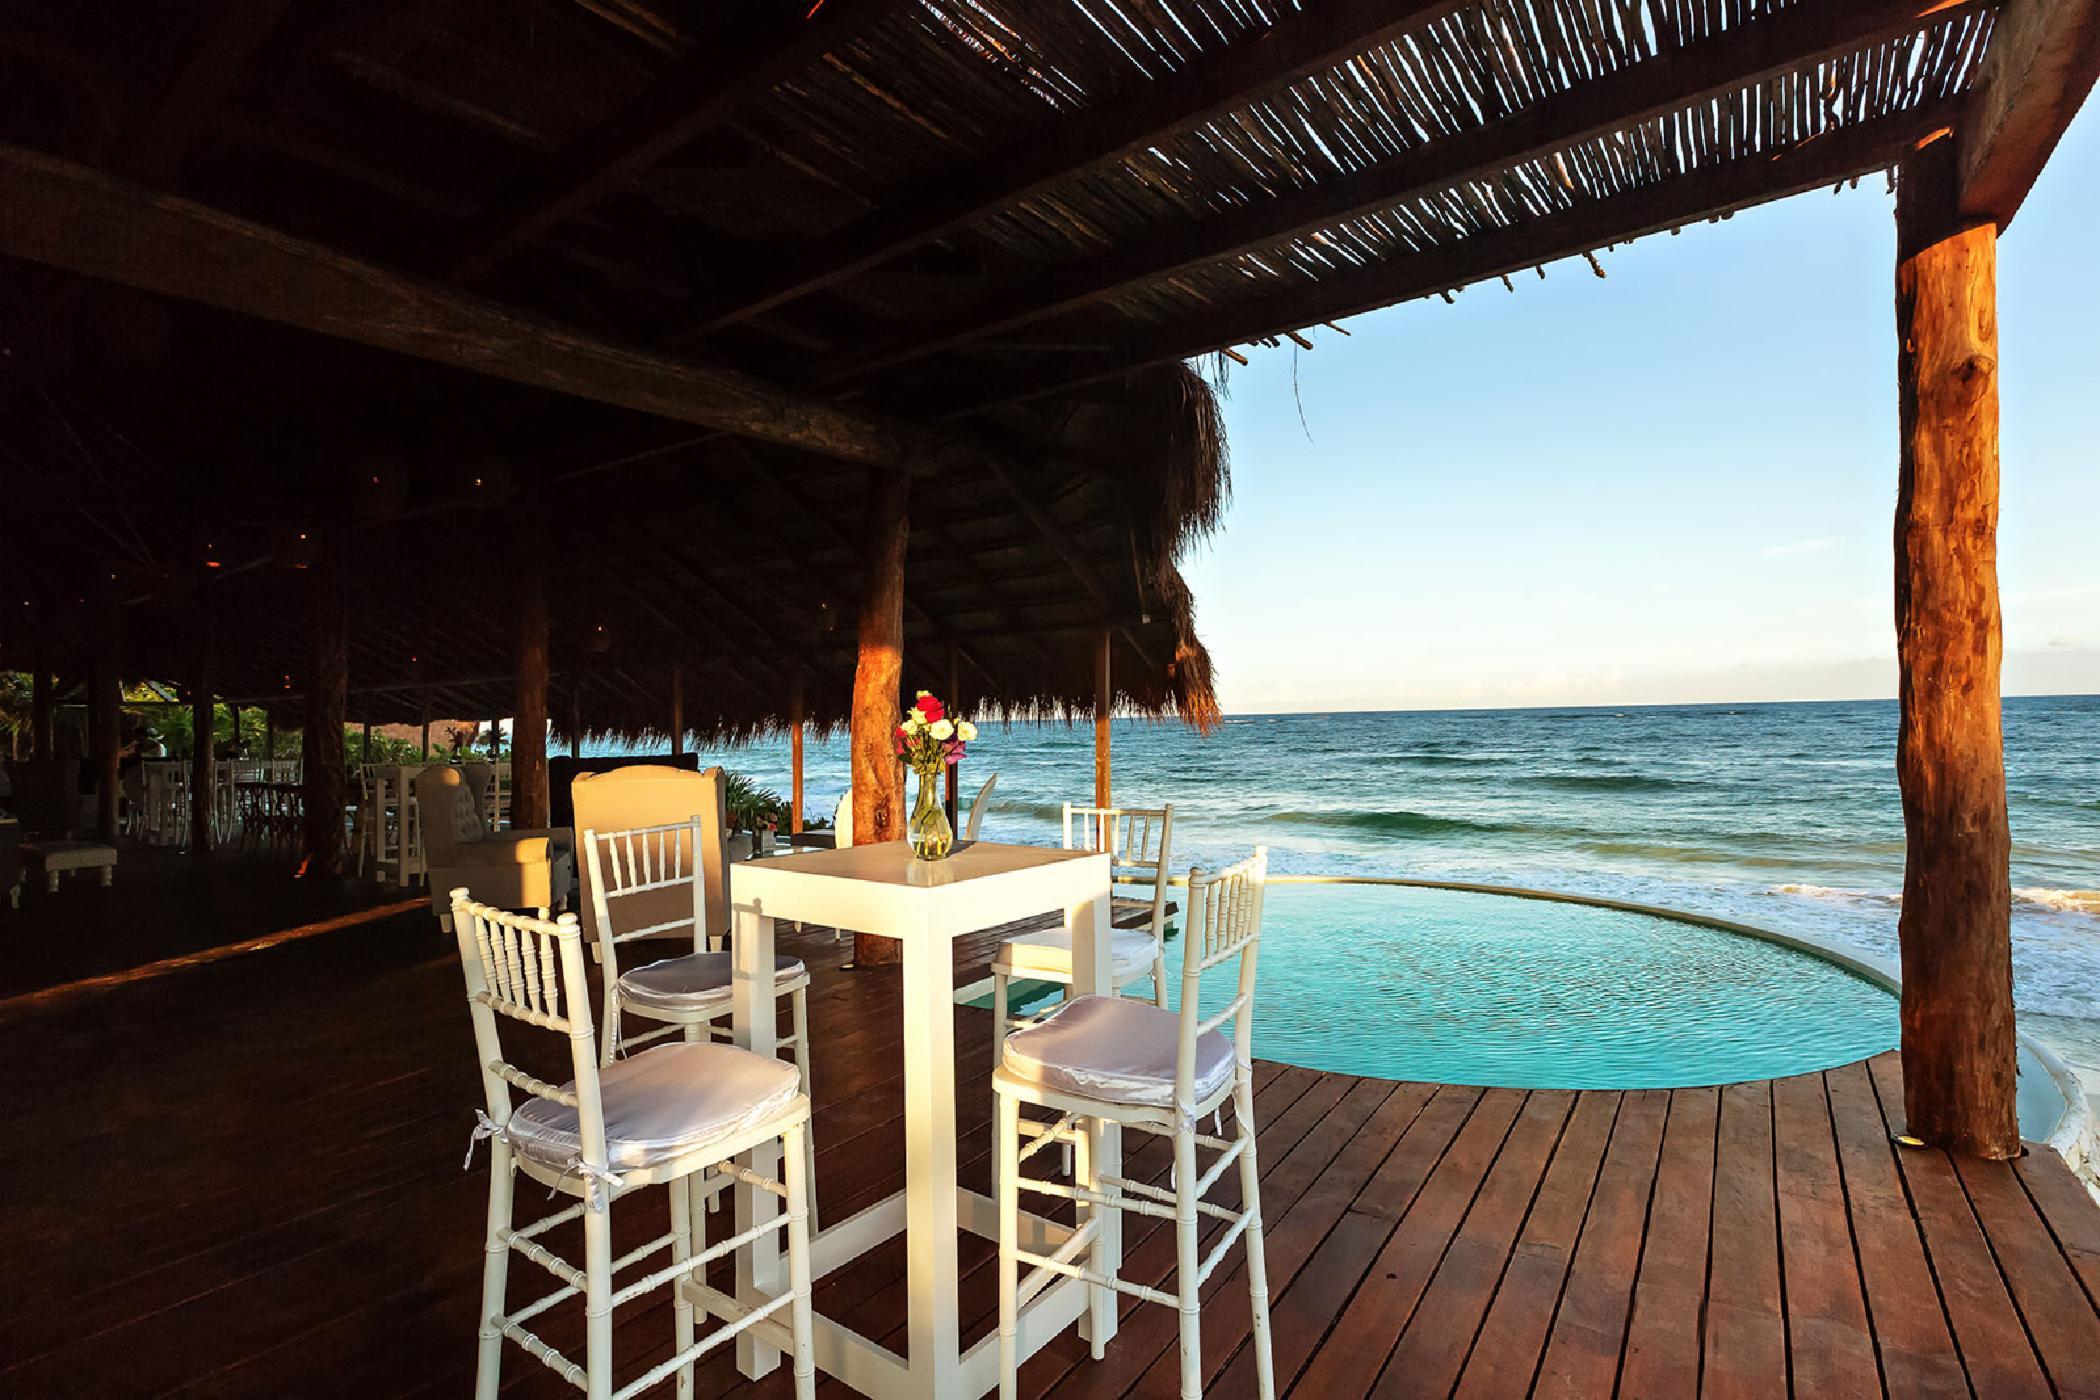 Maya_Luxe_Riviera_Maya_Luxury_Villas_Experiences_Hotel_Zone_Tulum_Beach_5_Bedrooms_Casa_Palapa_22.jpg